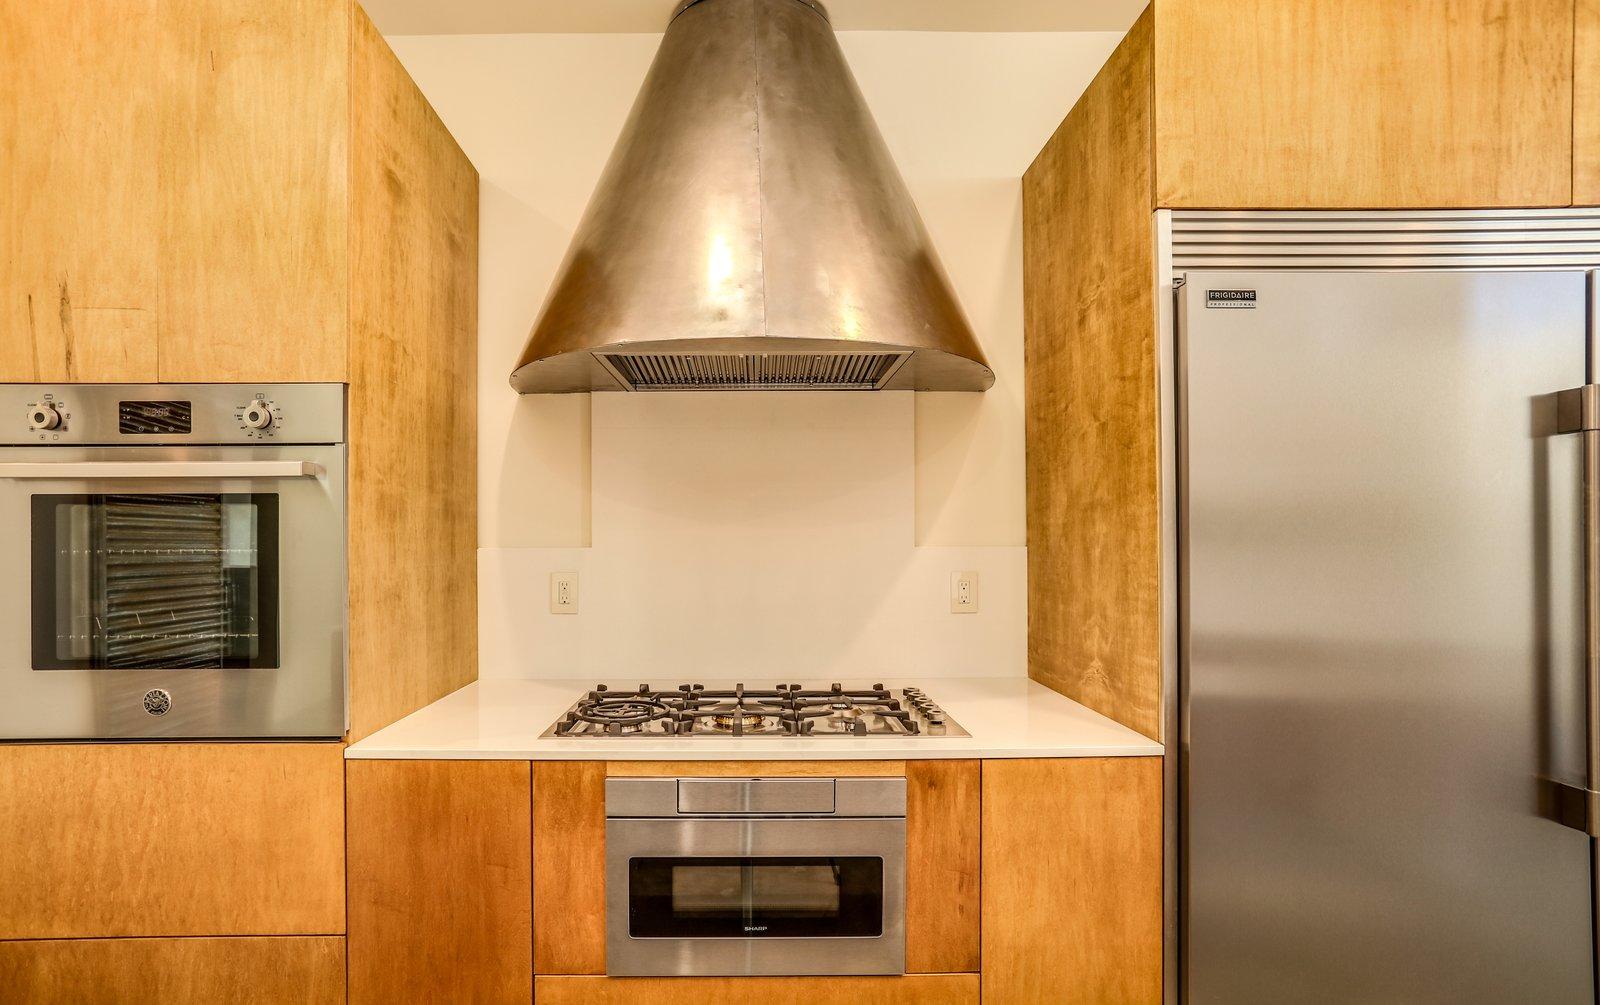 The Guthrie House by Avi Ross Group Kitchen After Custom Range Hood